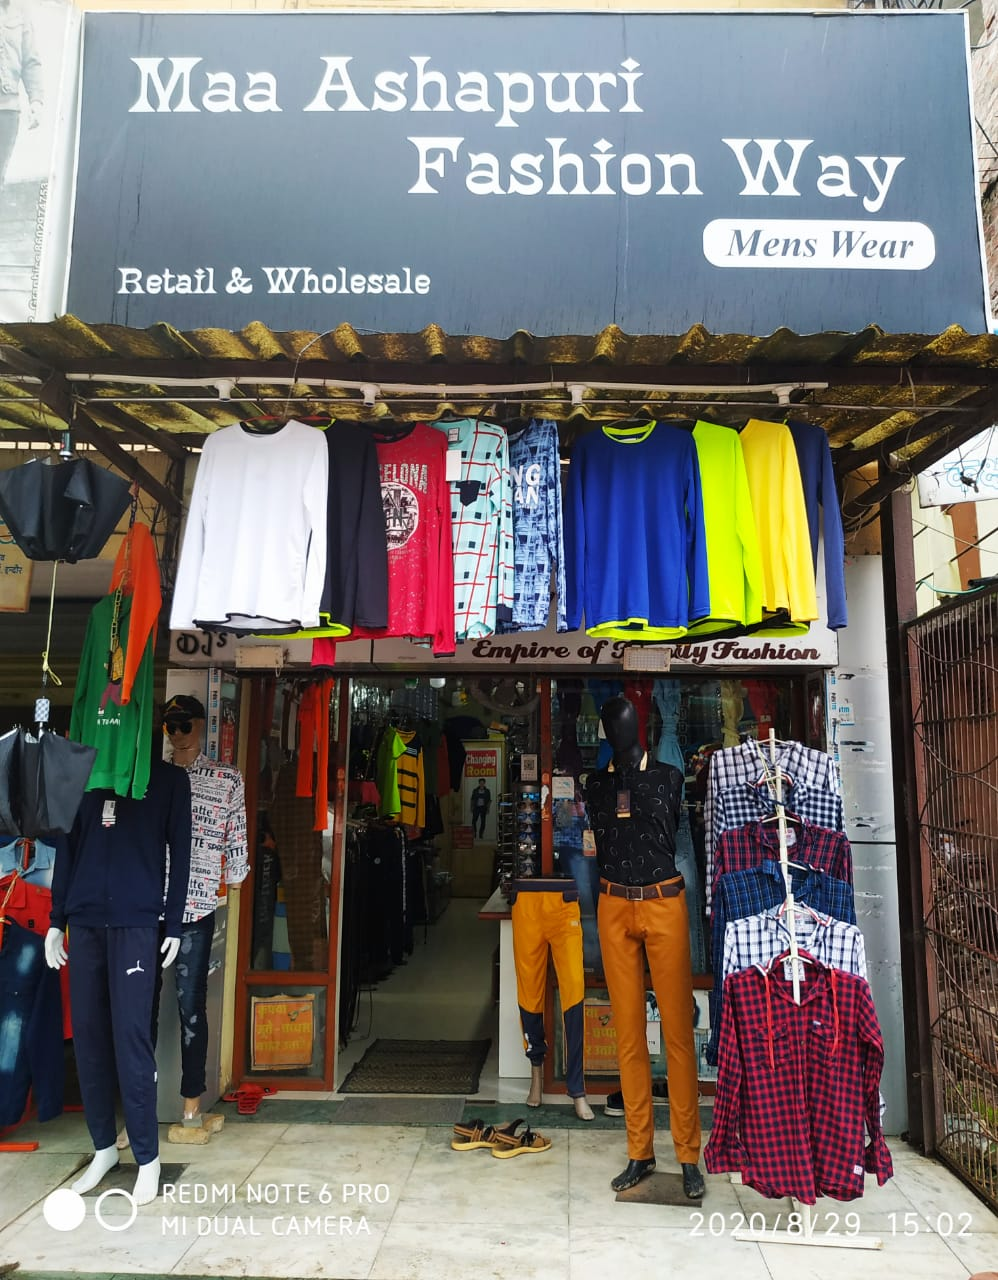 Maa ashapurni fashion way